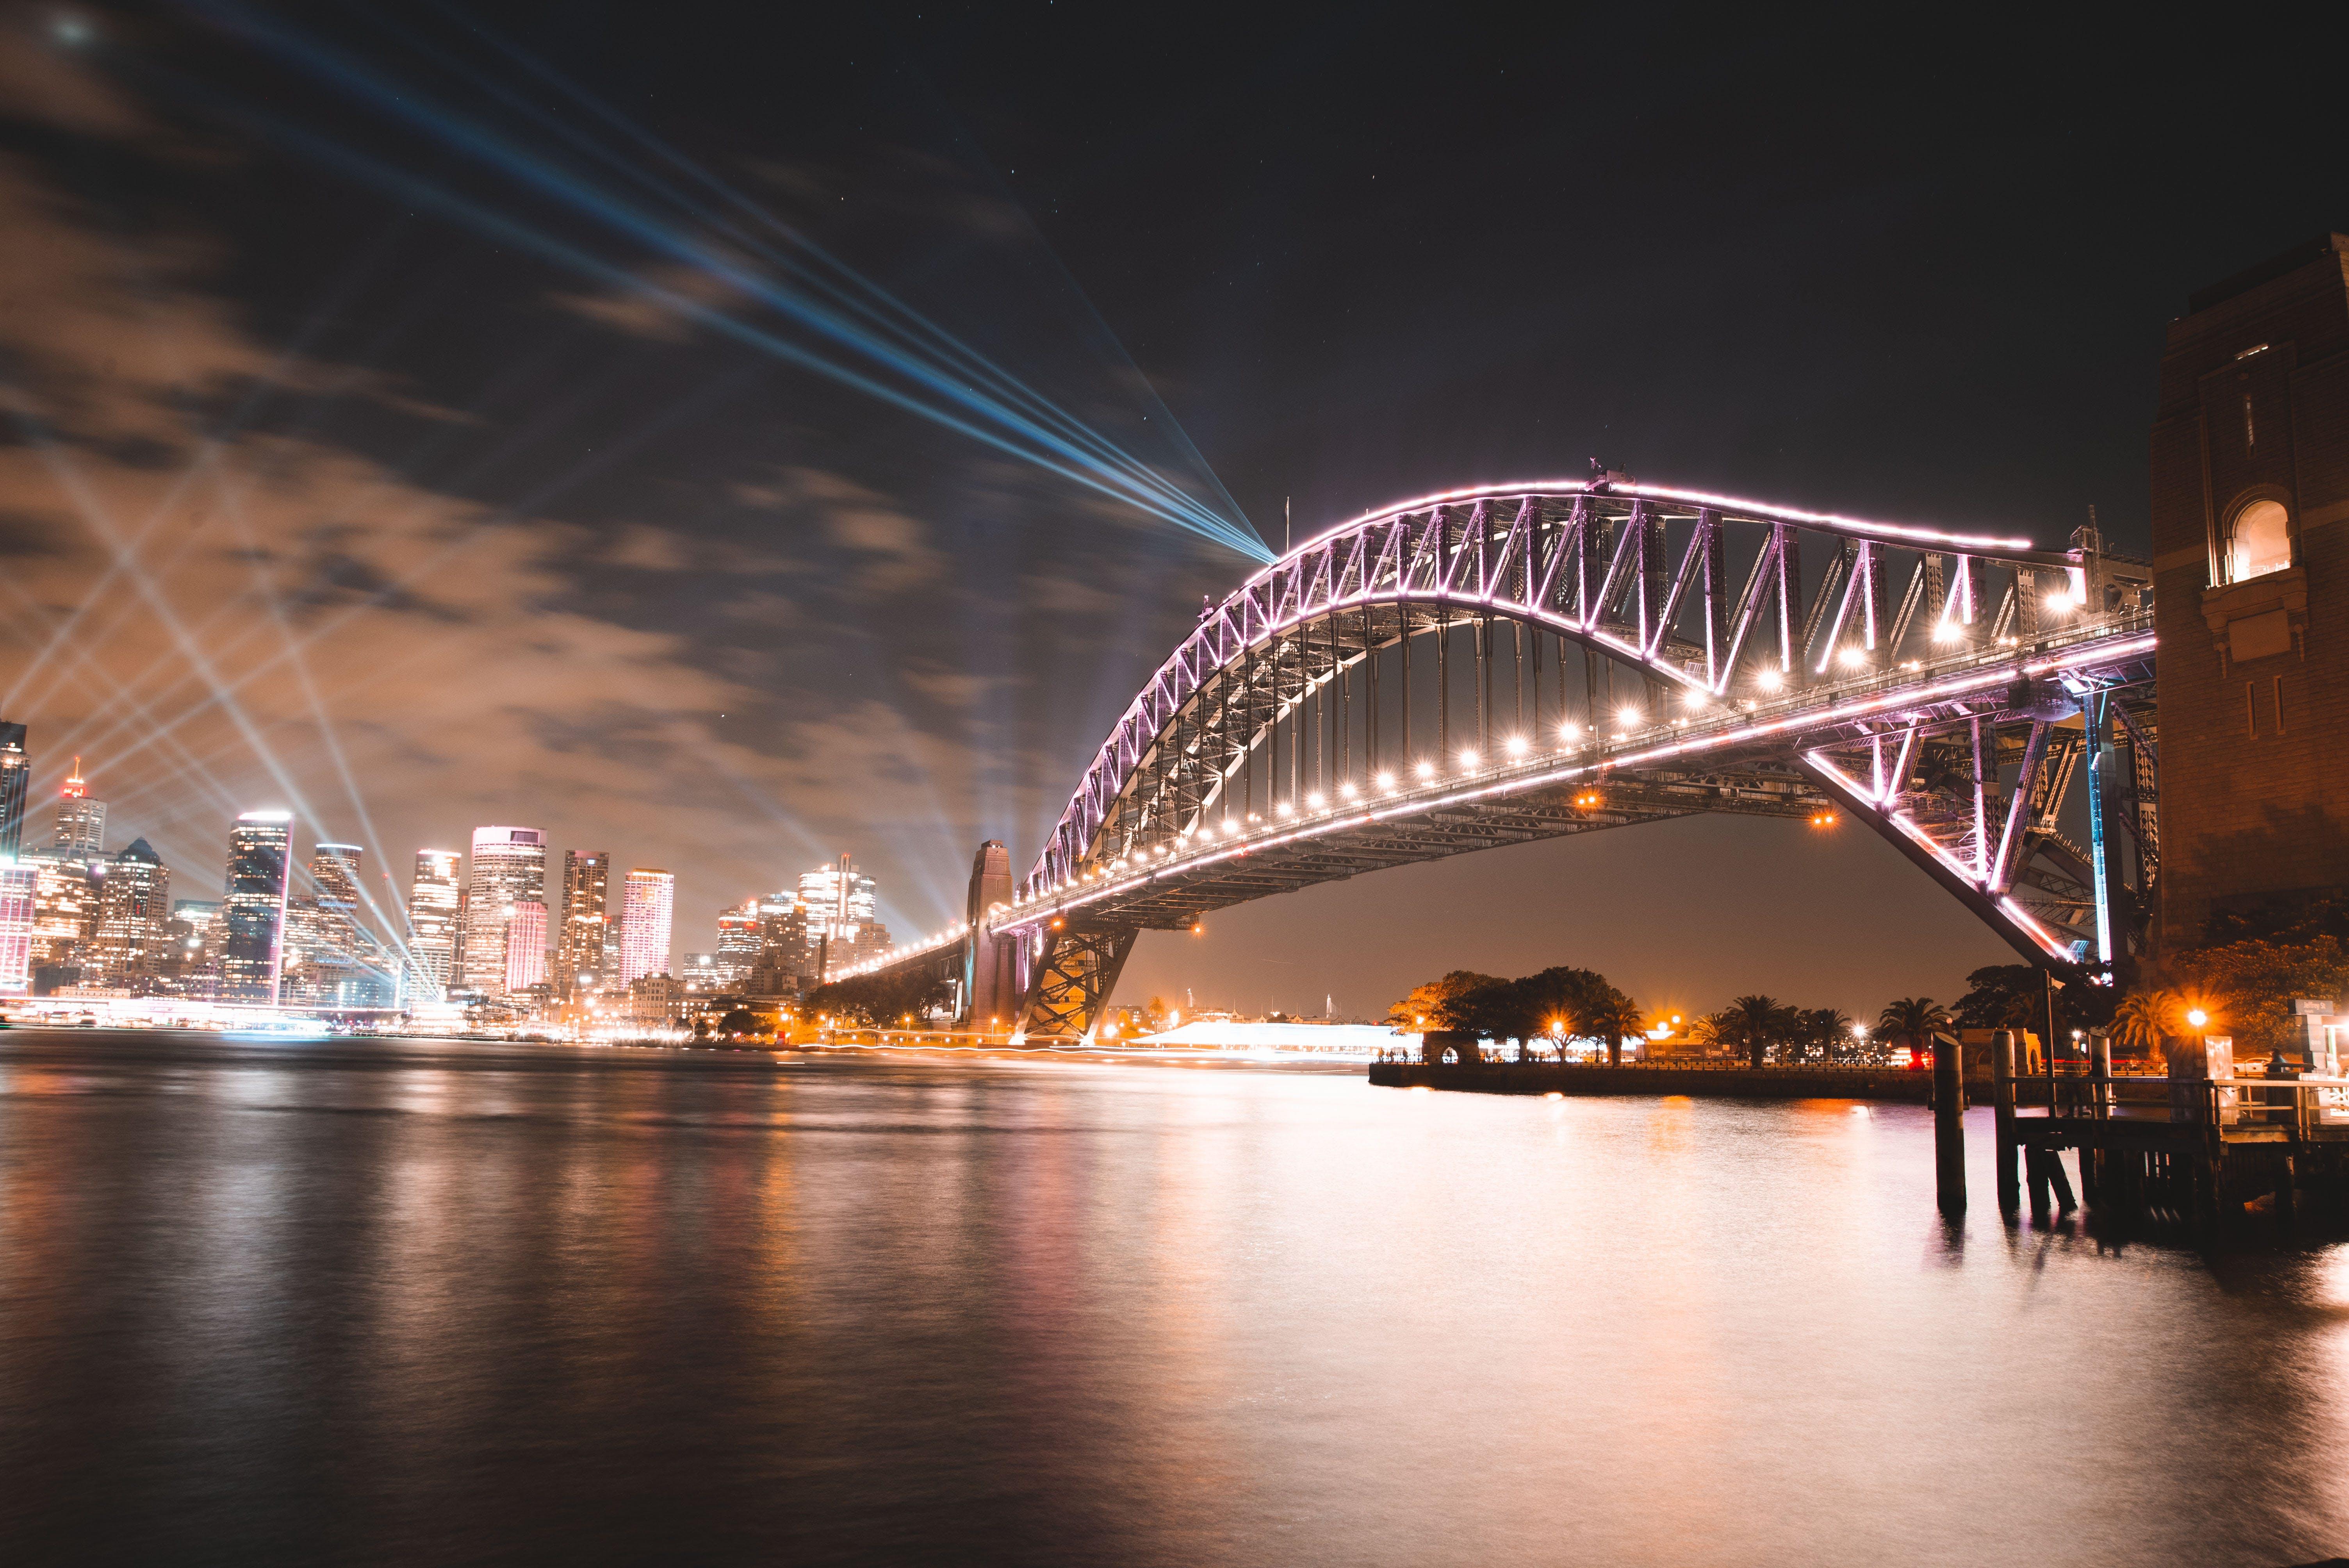 Purple Concrete Bridge Across Body of Water